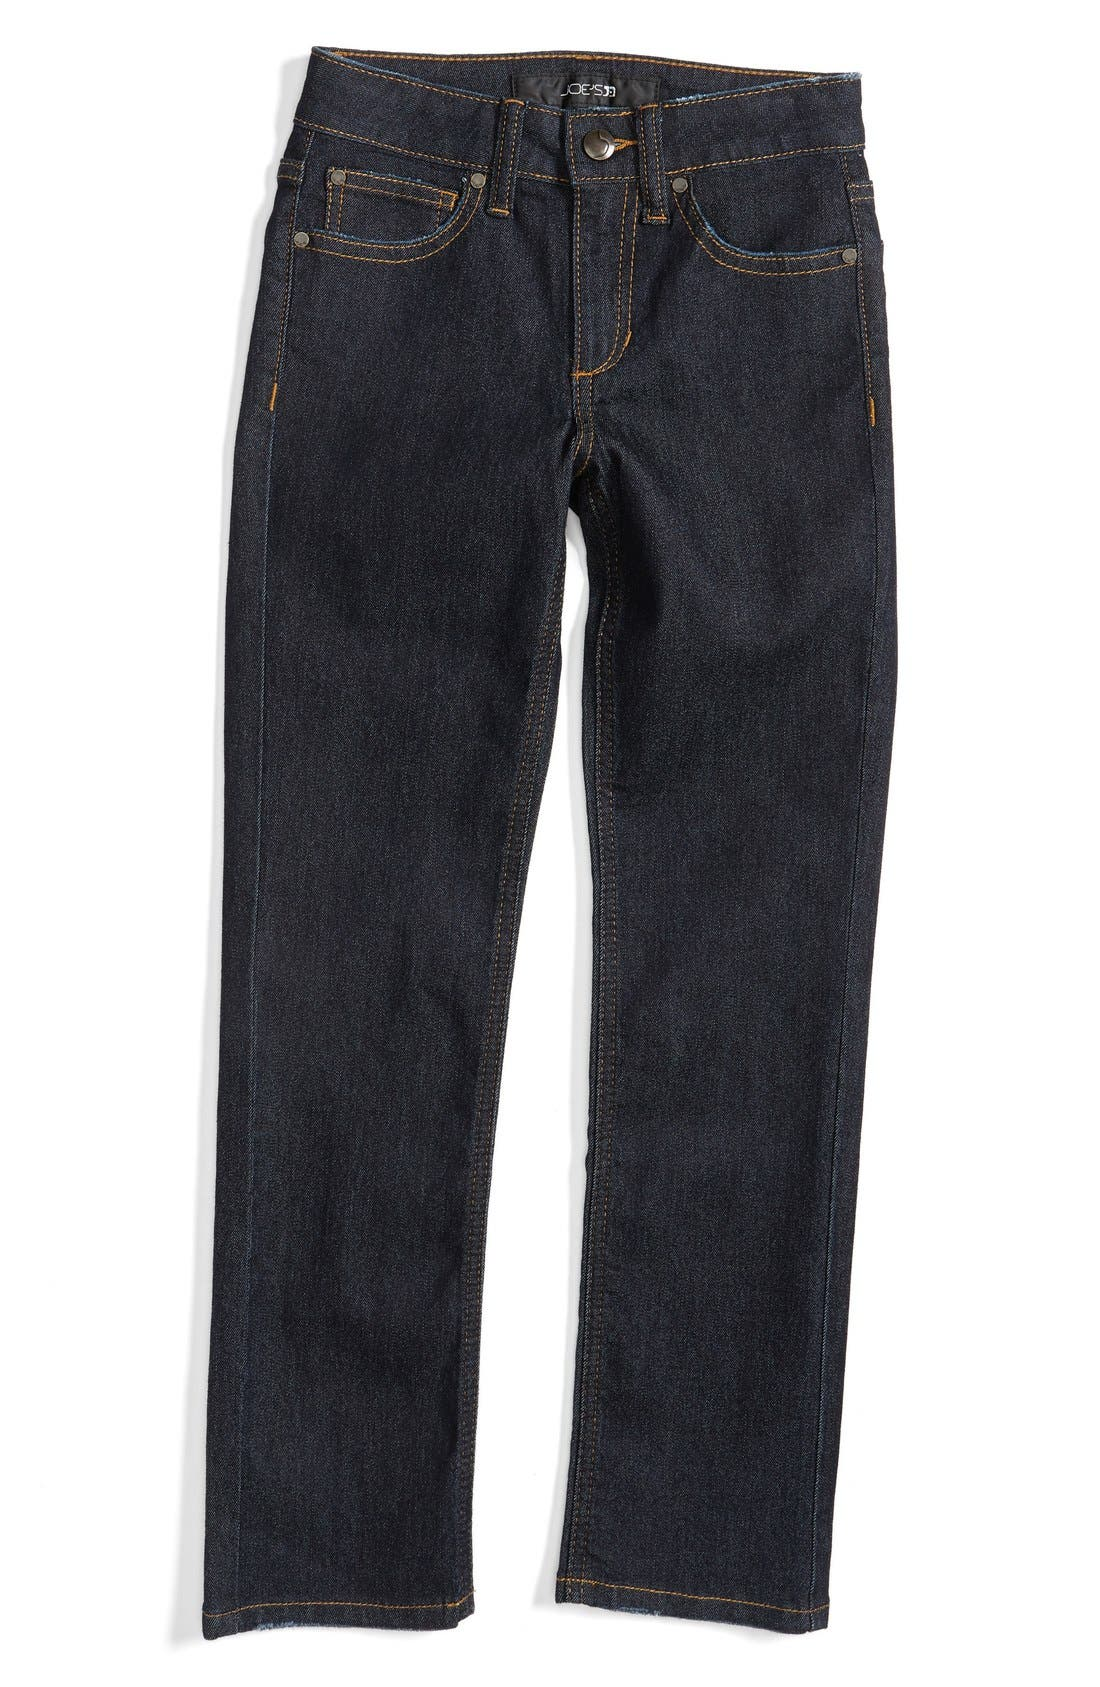 Brixton Straight Leg Jeans,                             Main thumbnail 1, color,                             400